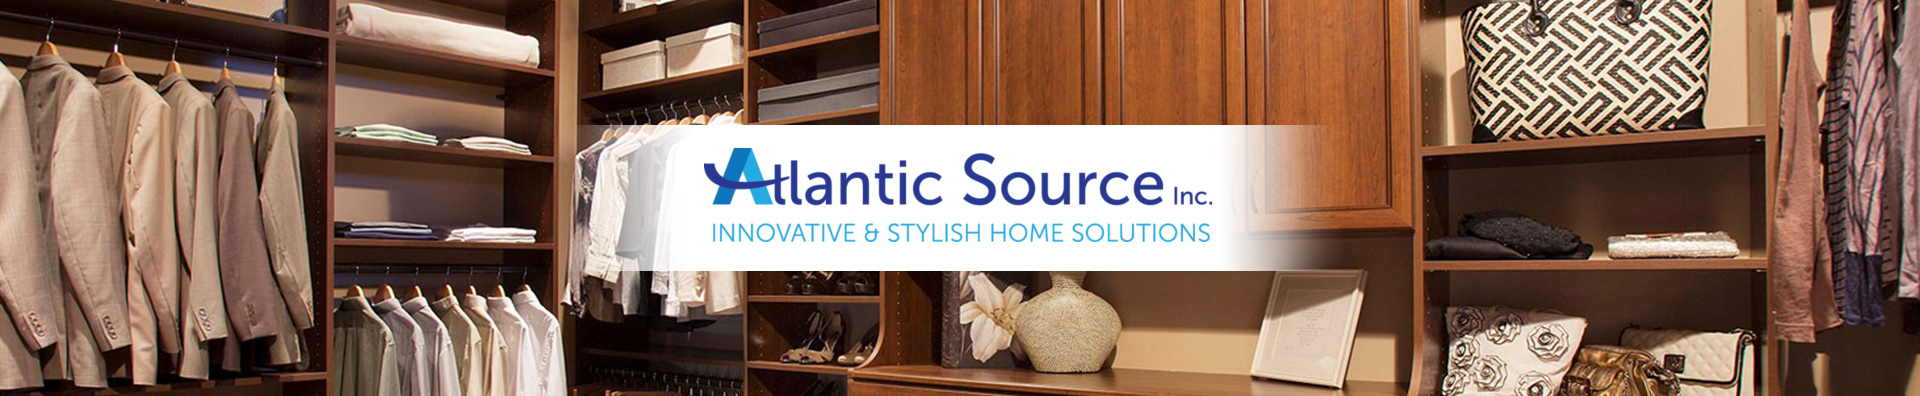 Atlantic Source Inc.